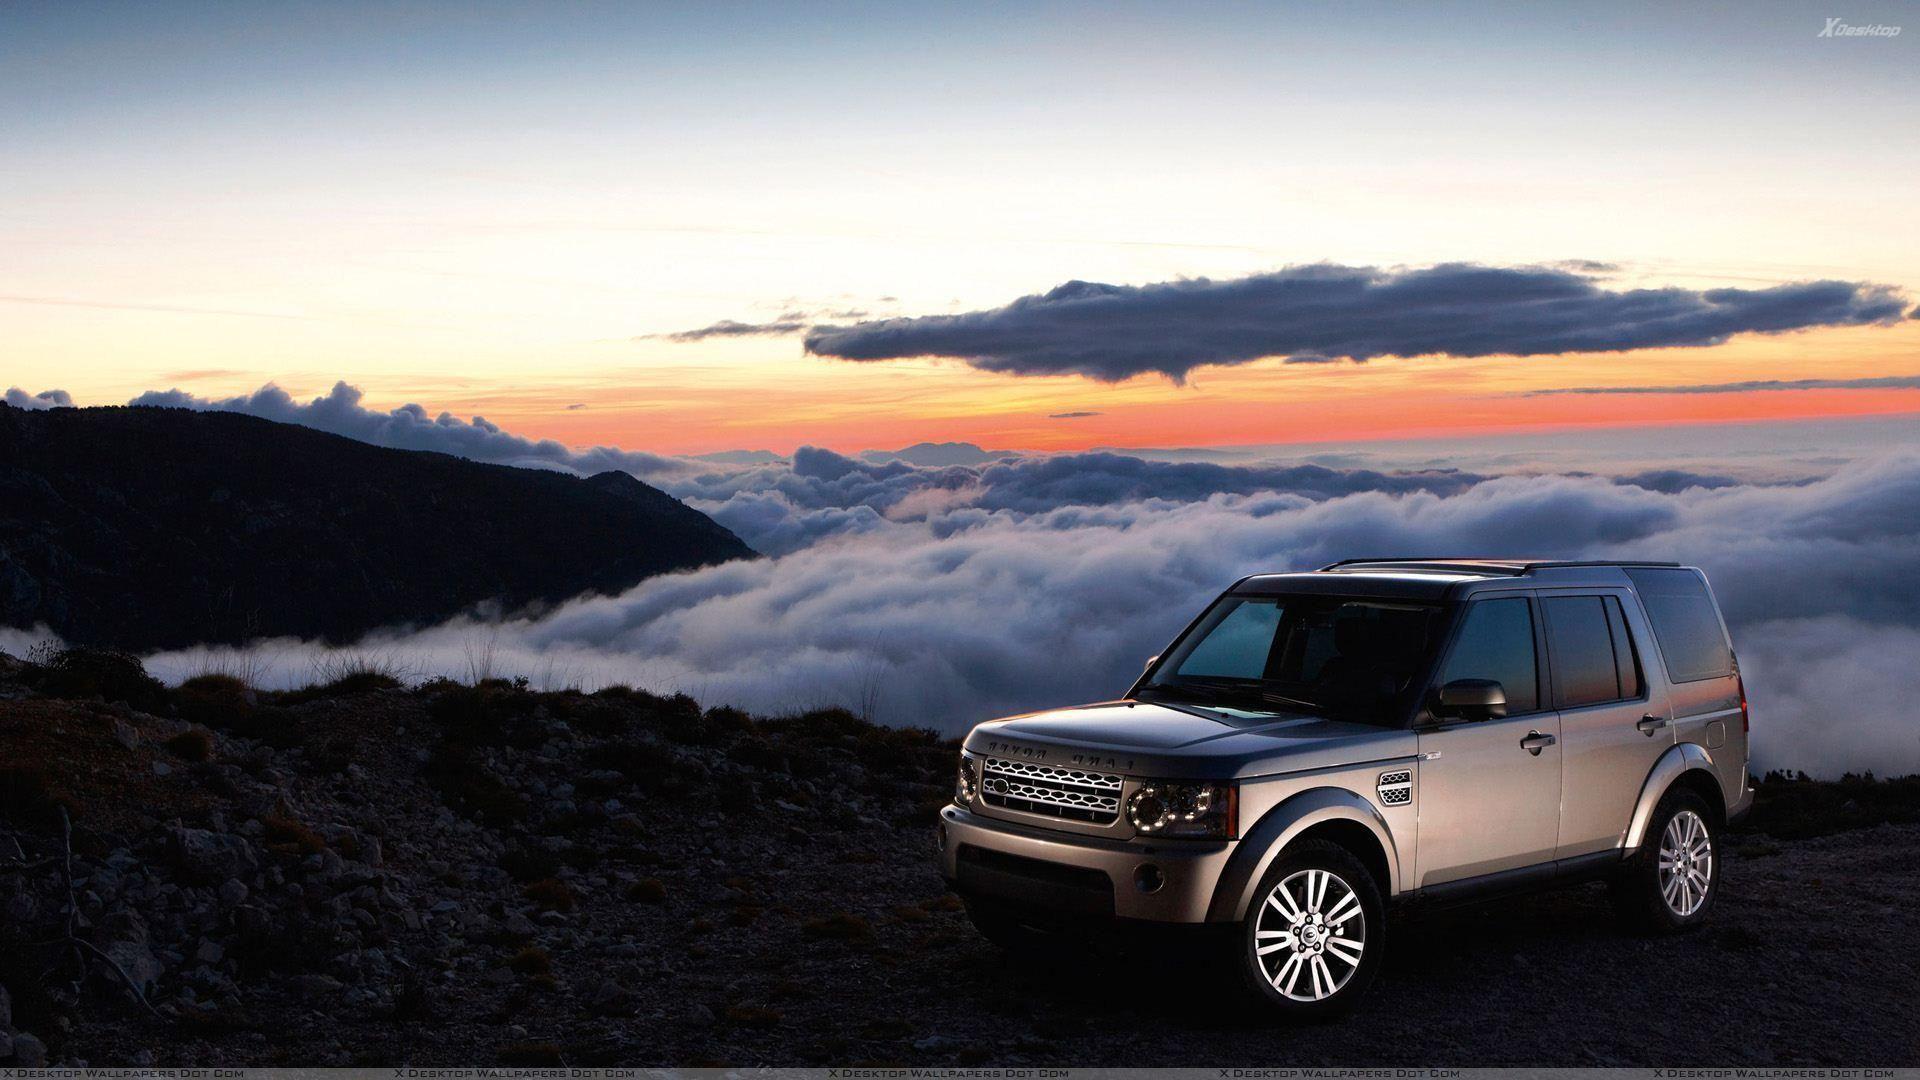 Range Rover background wallpaper